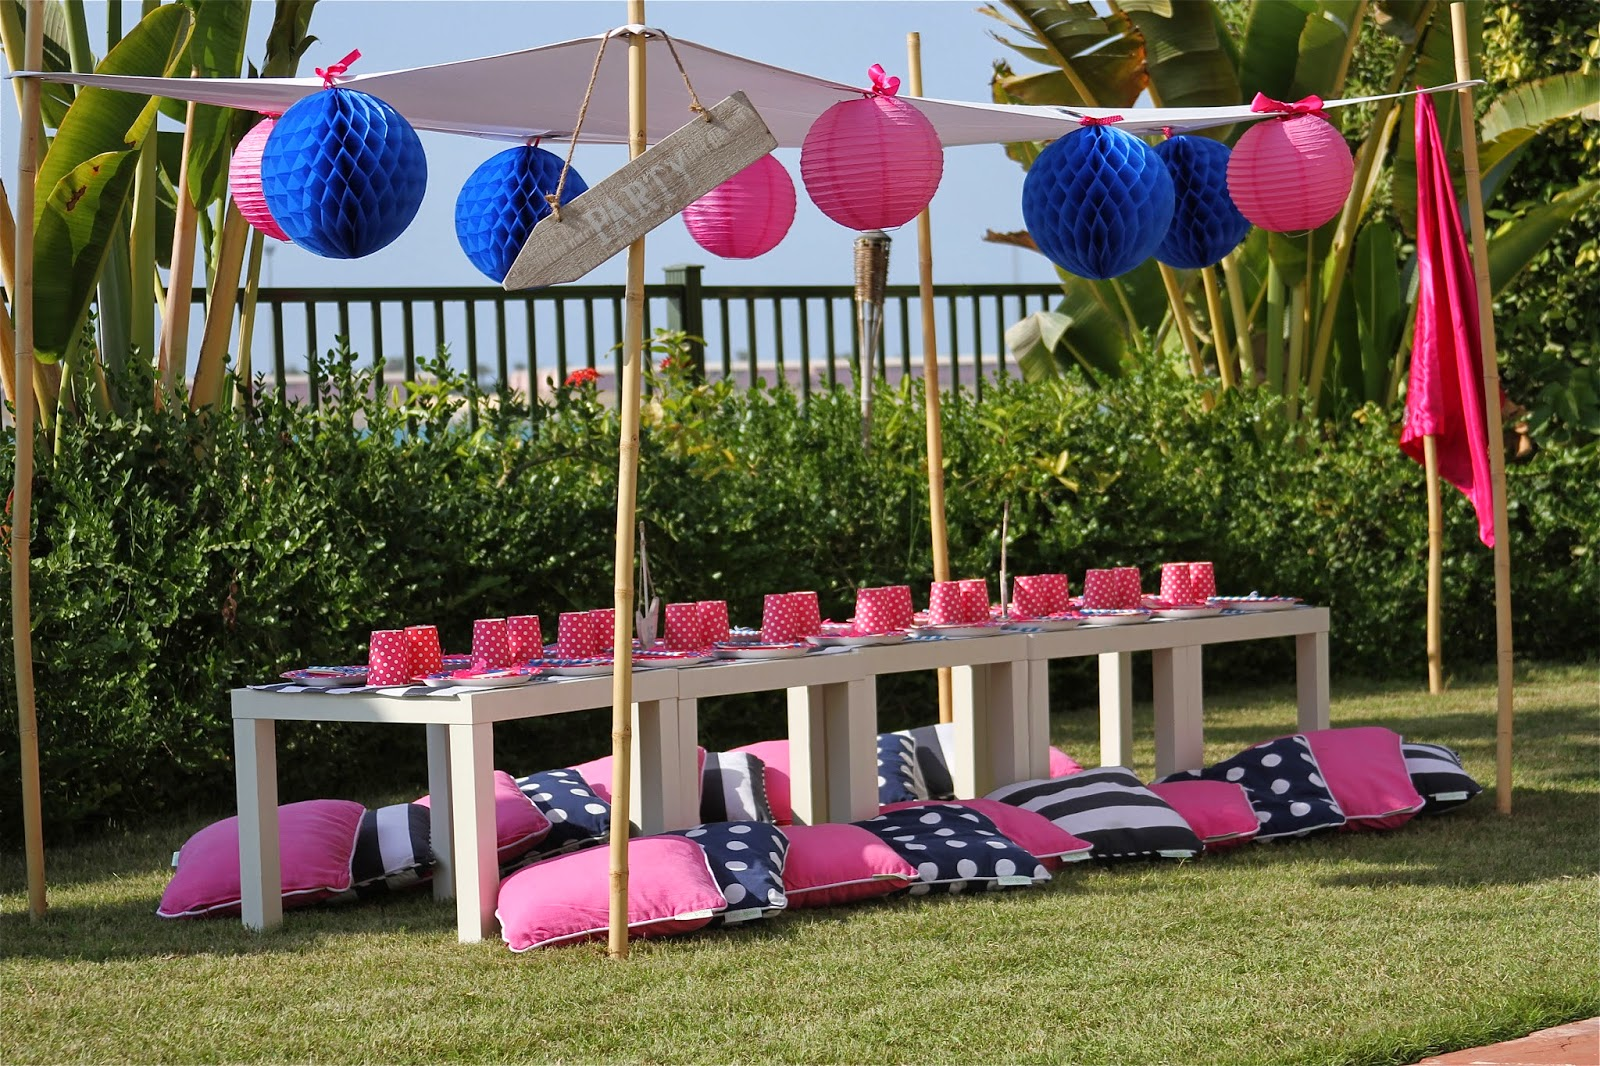 Thaynara lopes blog ideias para festa na piscina poolparty for Piscina party